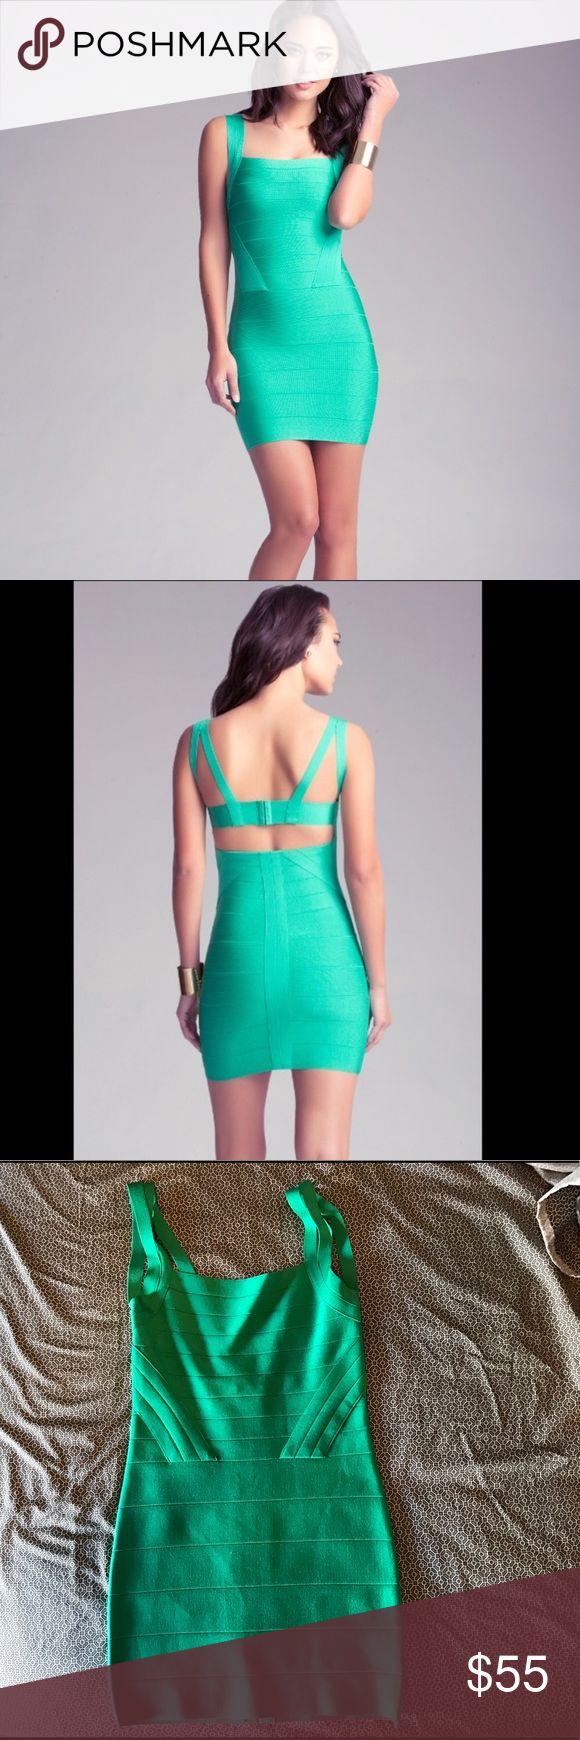 Bebe green bandage dress size medium So cute and in great condition. Bebe bandage dress in size medium bebe Dresses Mini